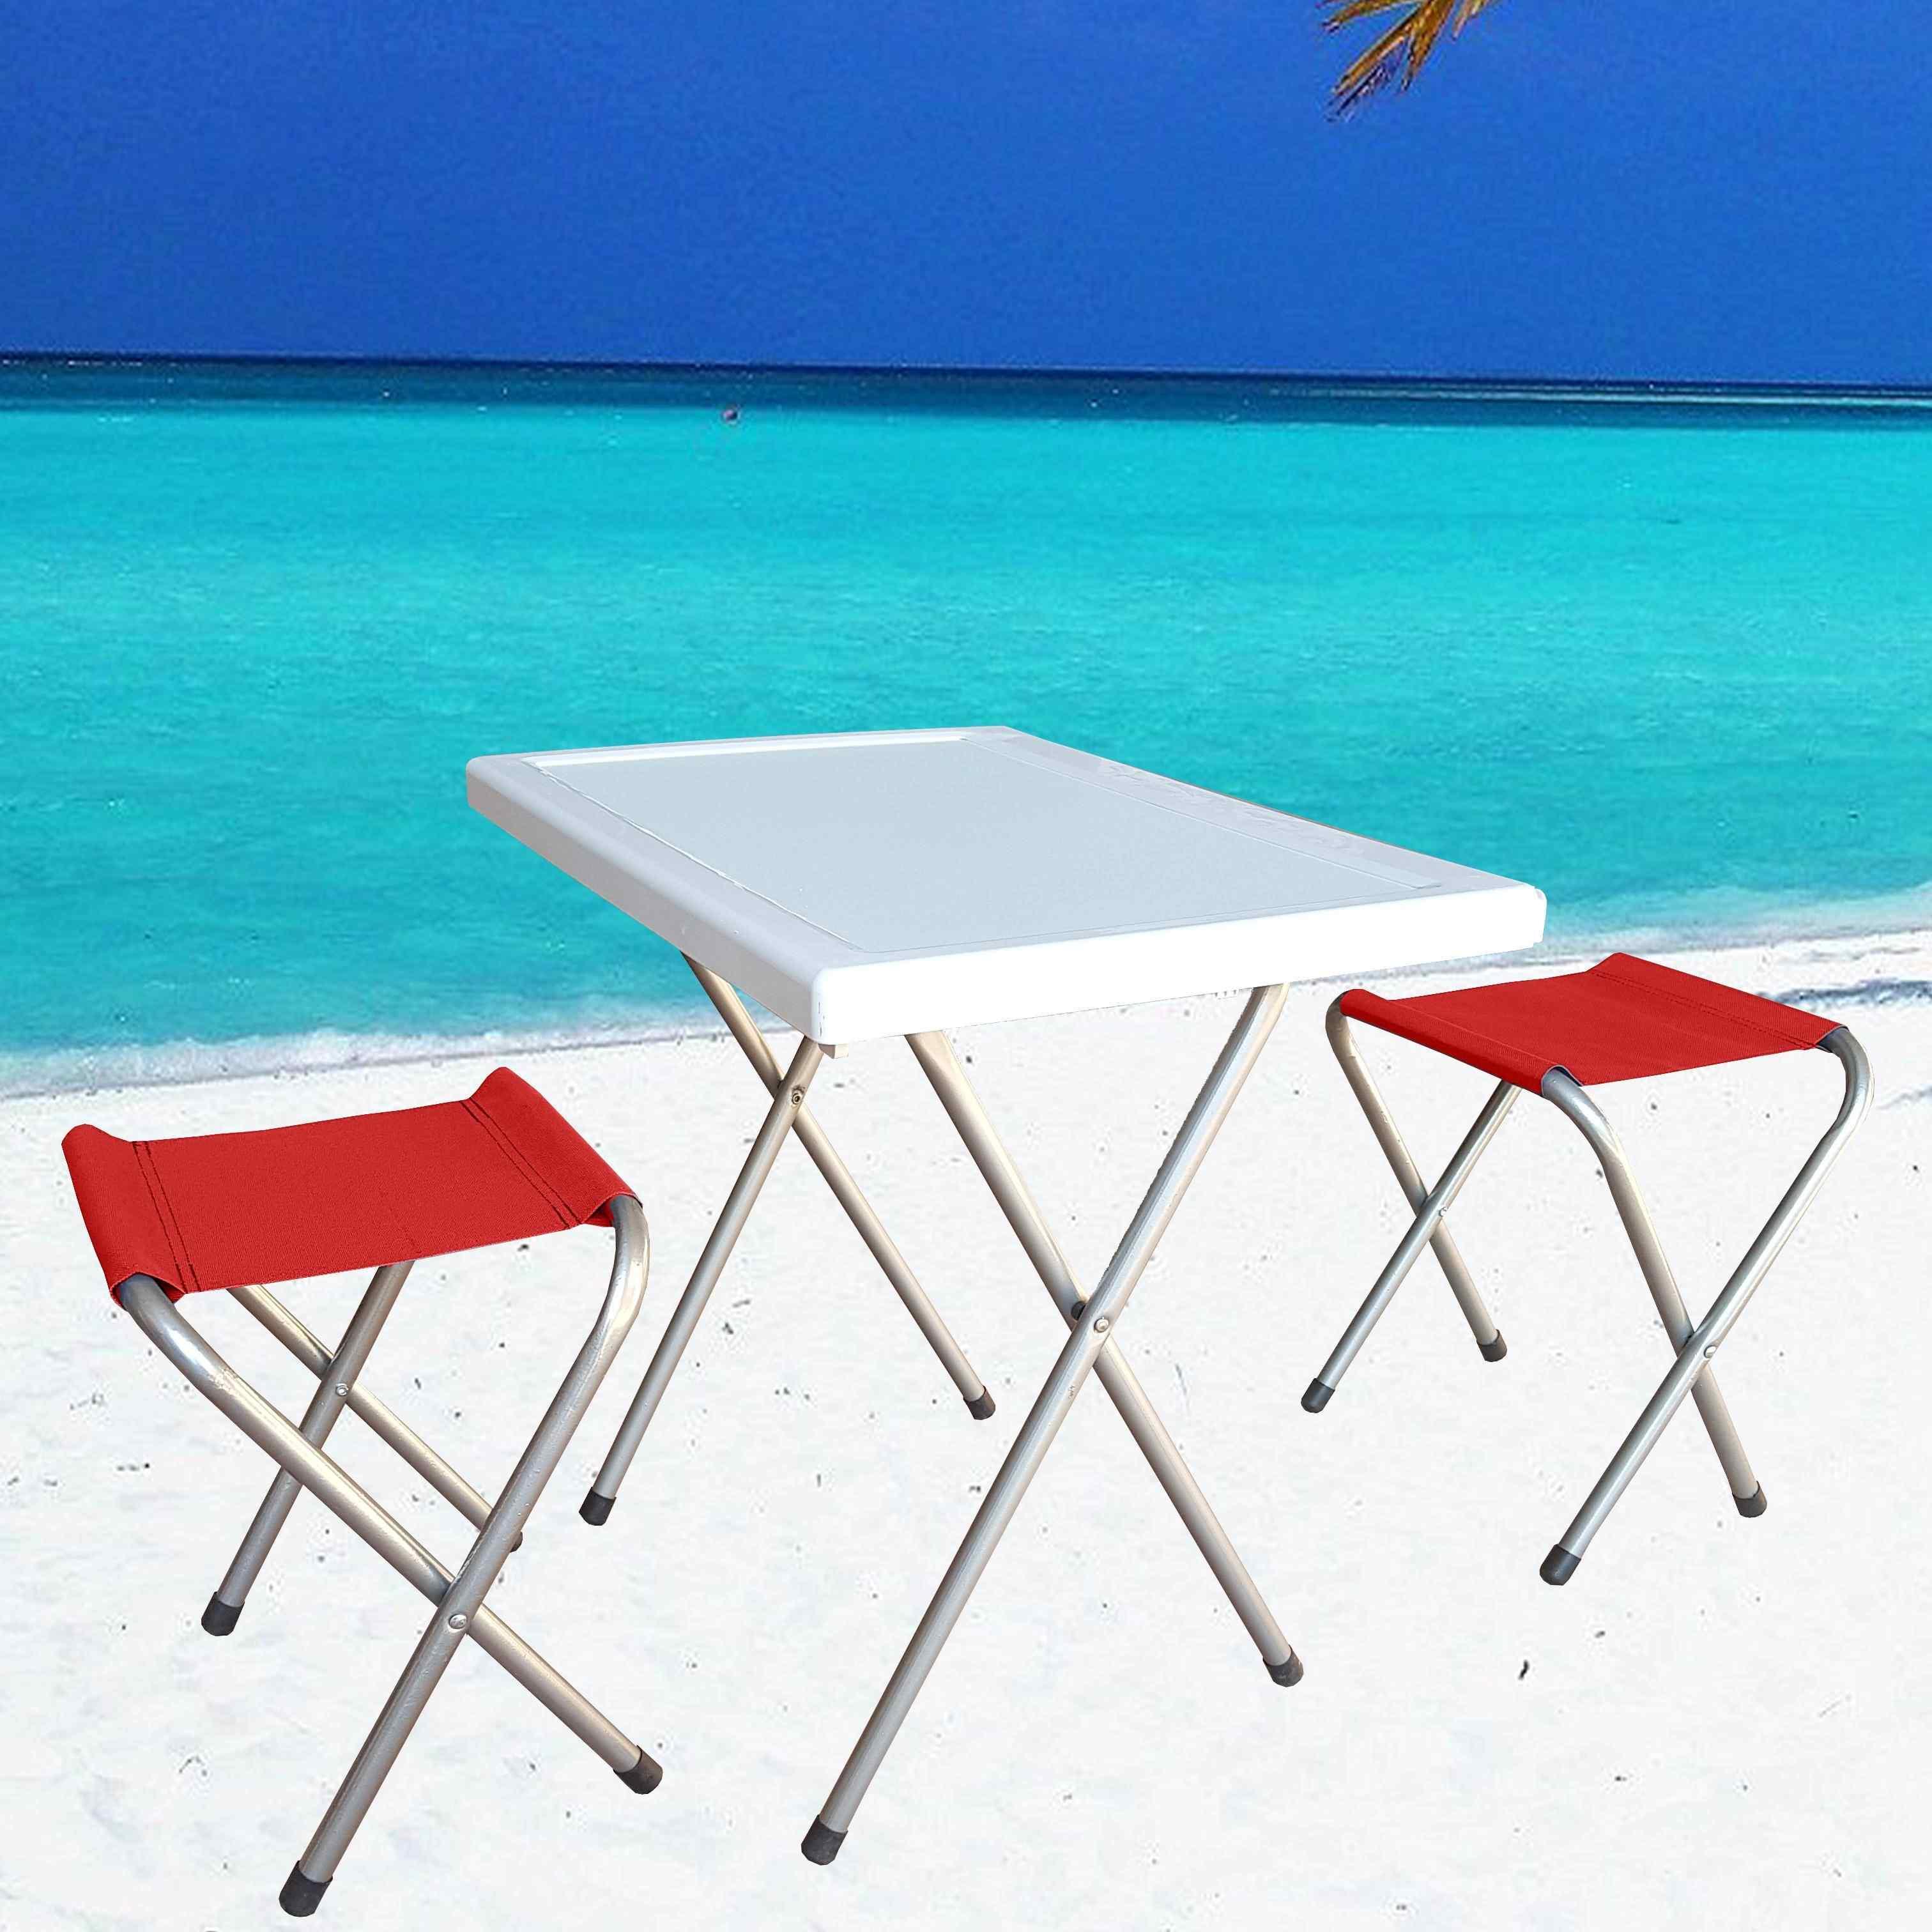 Small Portatif Piknik Seti 2 Tabure 1 Katlanır Masa Kırmızı